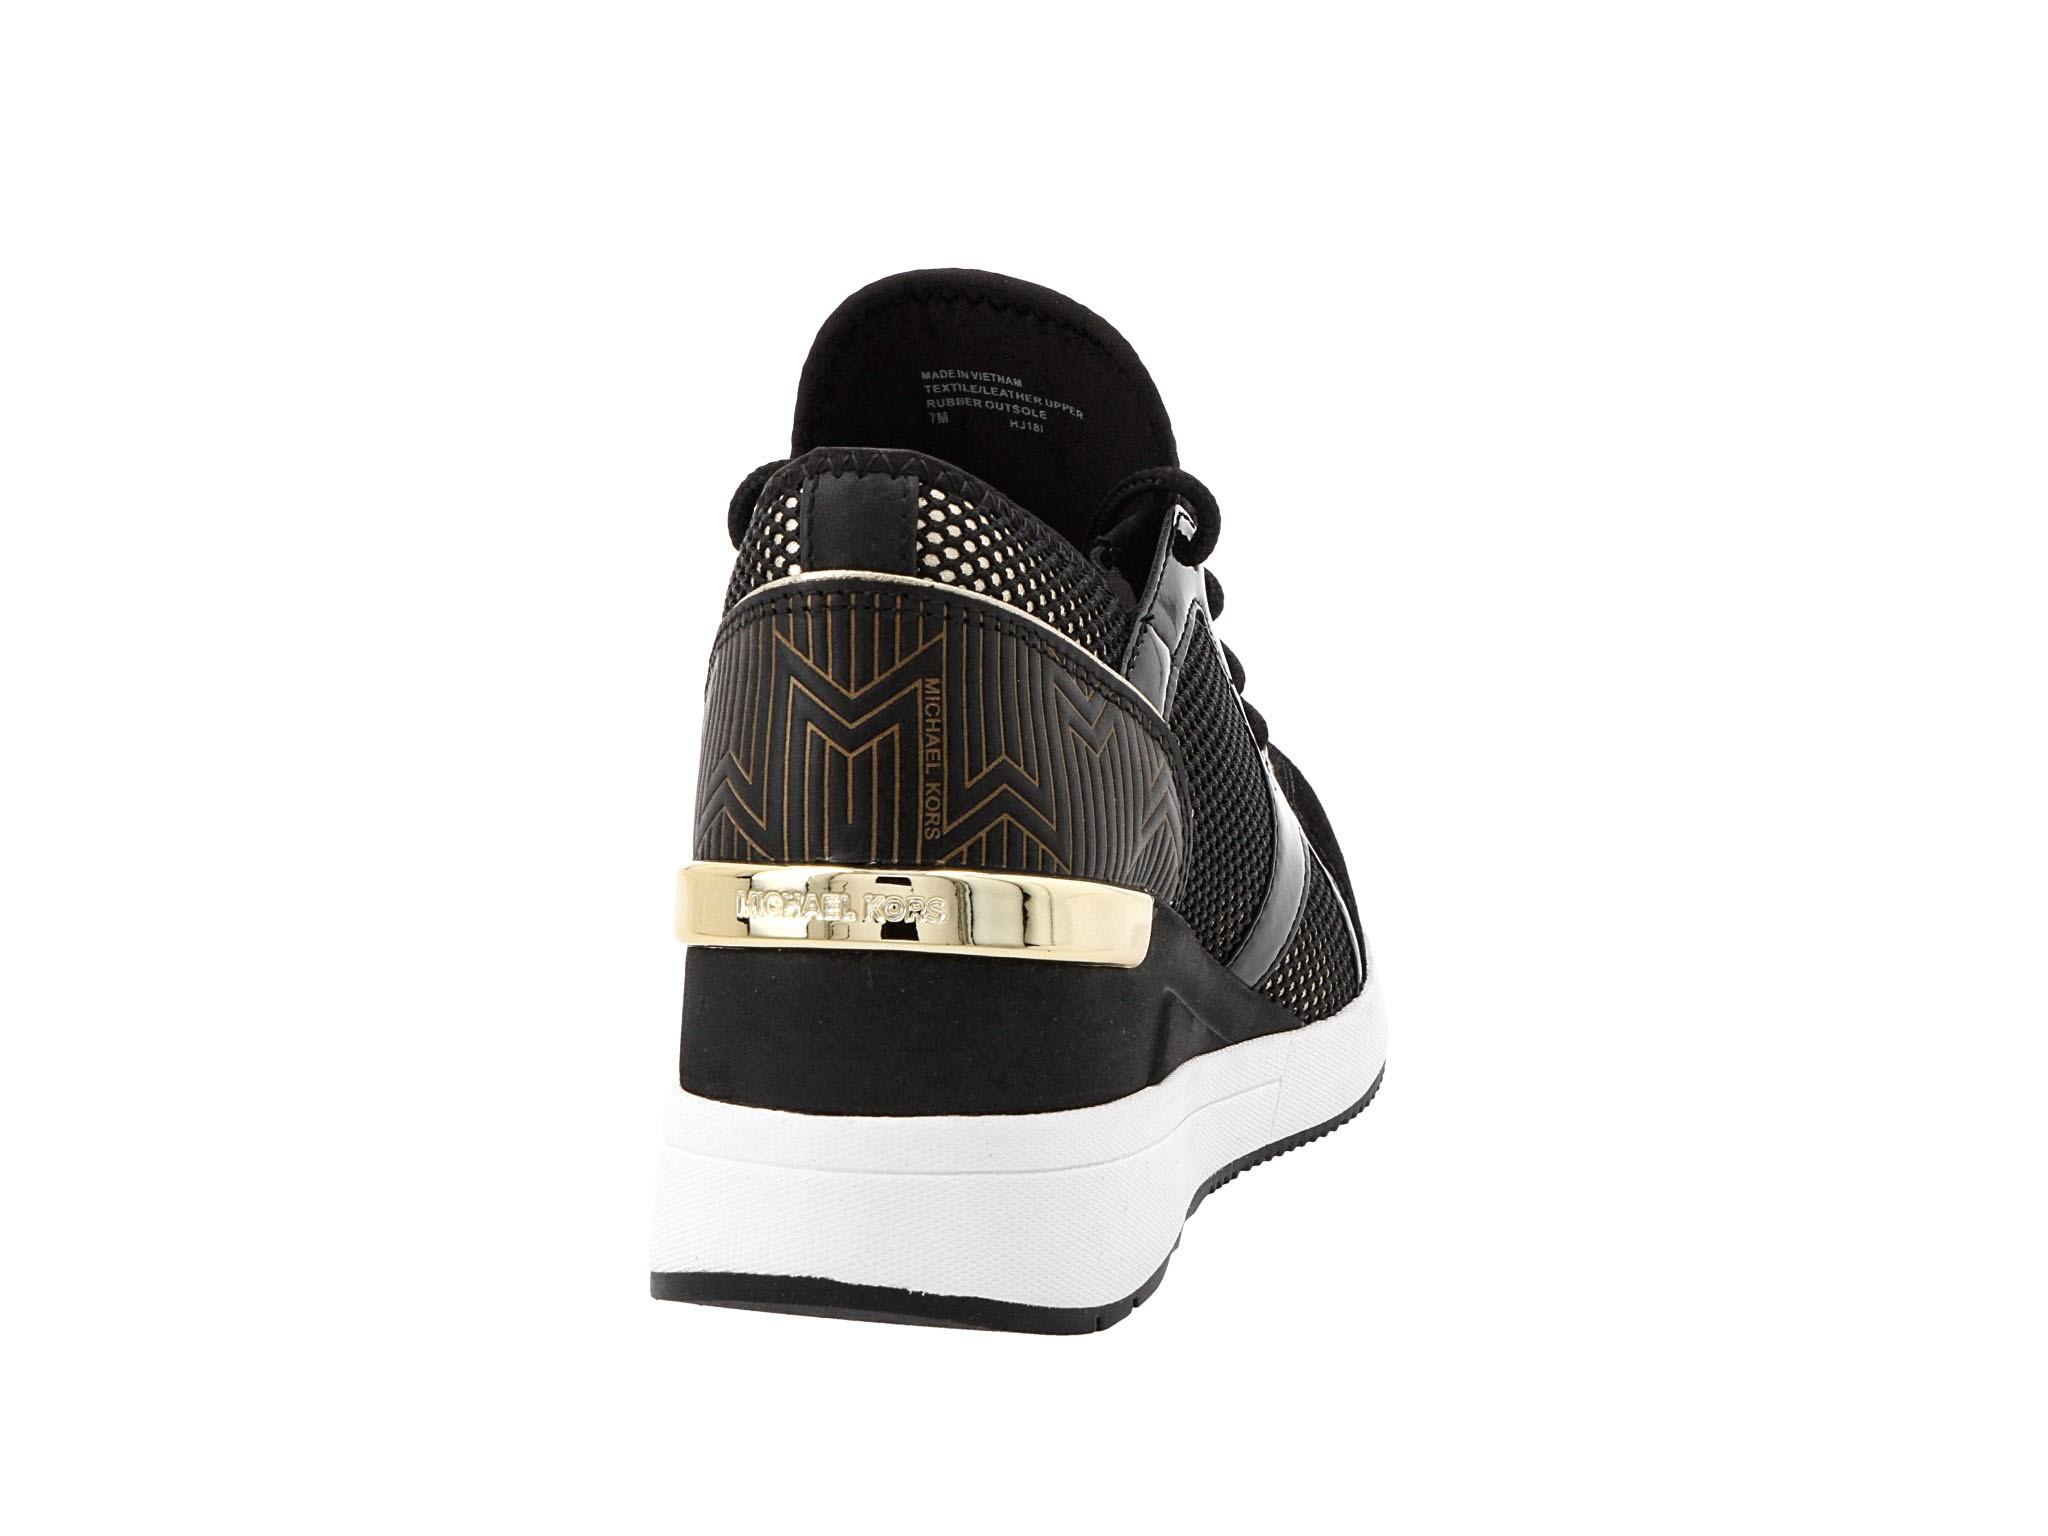 Sneakersy MICHAEL MICHAEL KORS Liv Trainer 43R9LVFS3D Blk